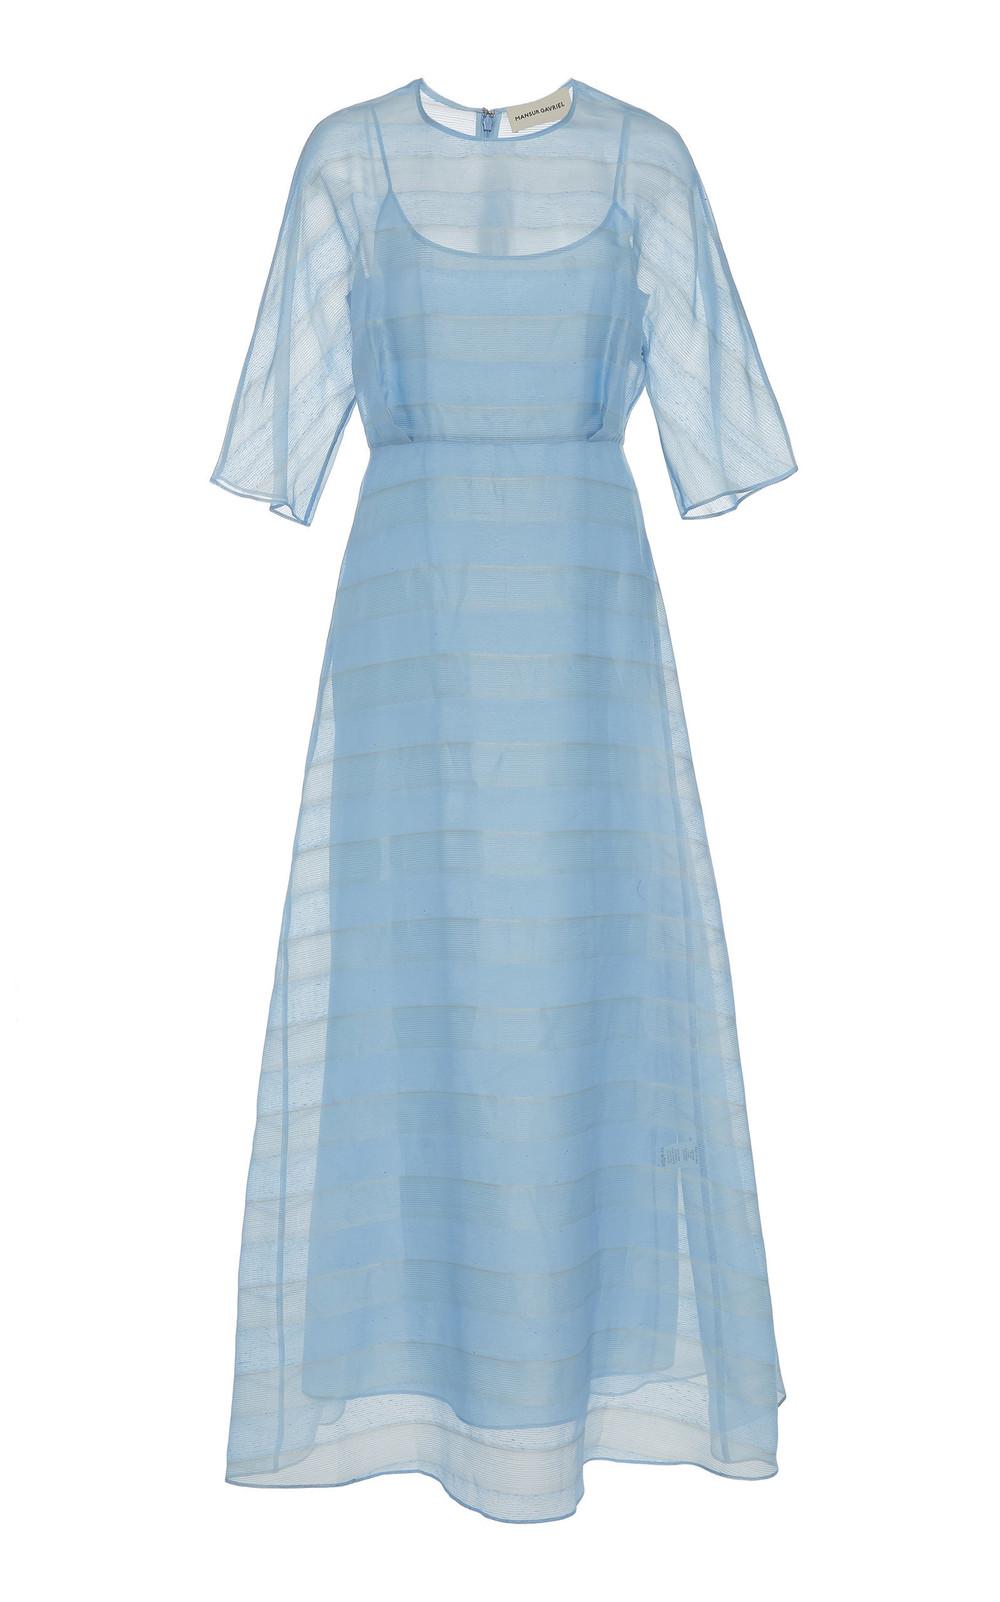 Mansur Gavriel Striped Silk-Voile Midi Dress in blue